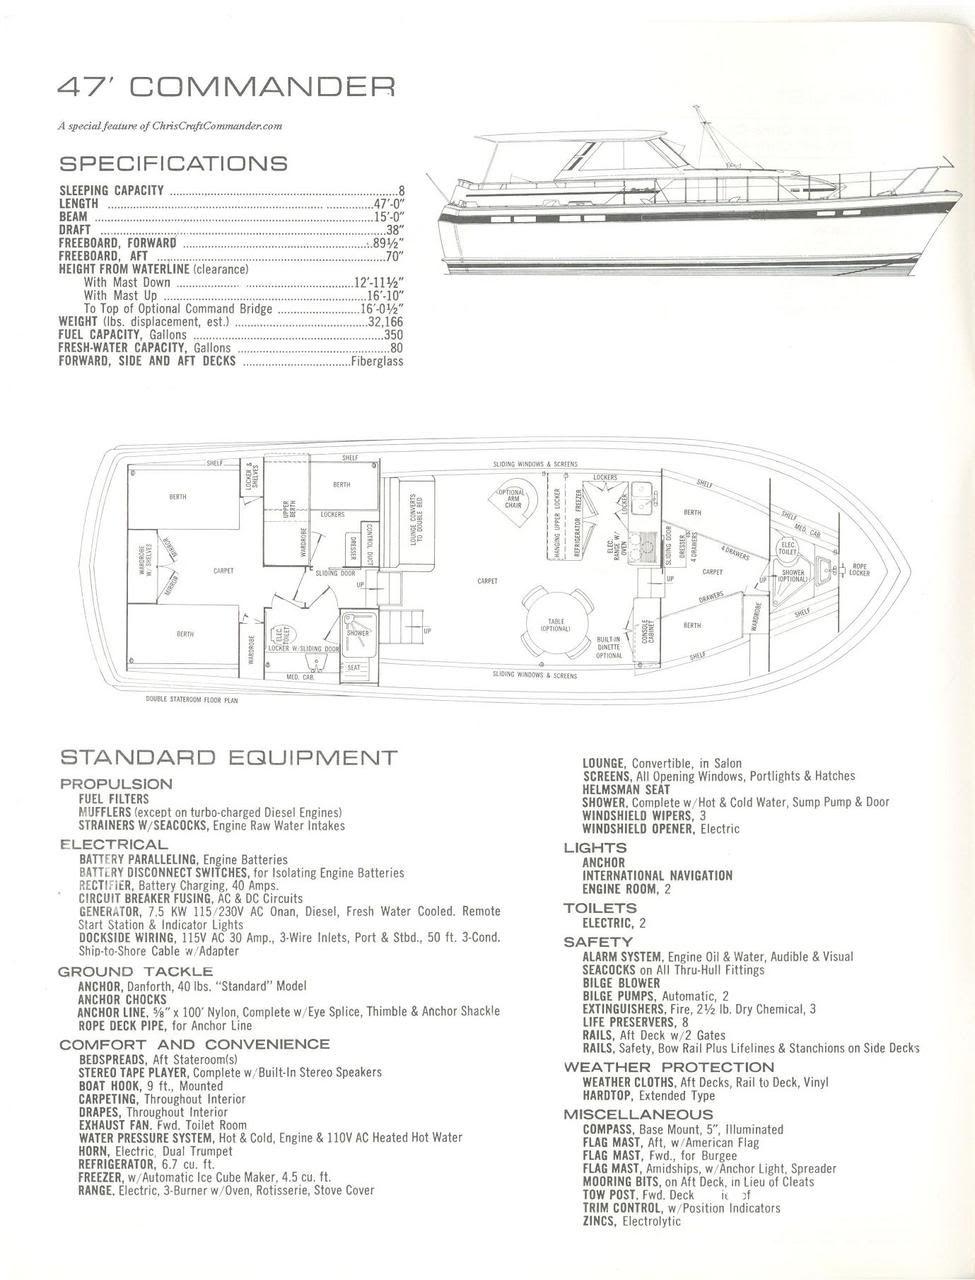 1955 Chris Craft Wiring Diagram Reinvent Your Smoker Boat 1972 47 Commander Specs And Floorplan Rh Pinterest Com Marine Engines Chrysler Ignition